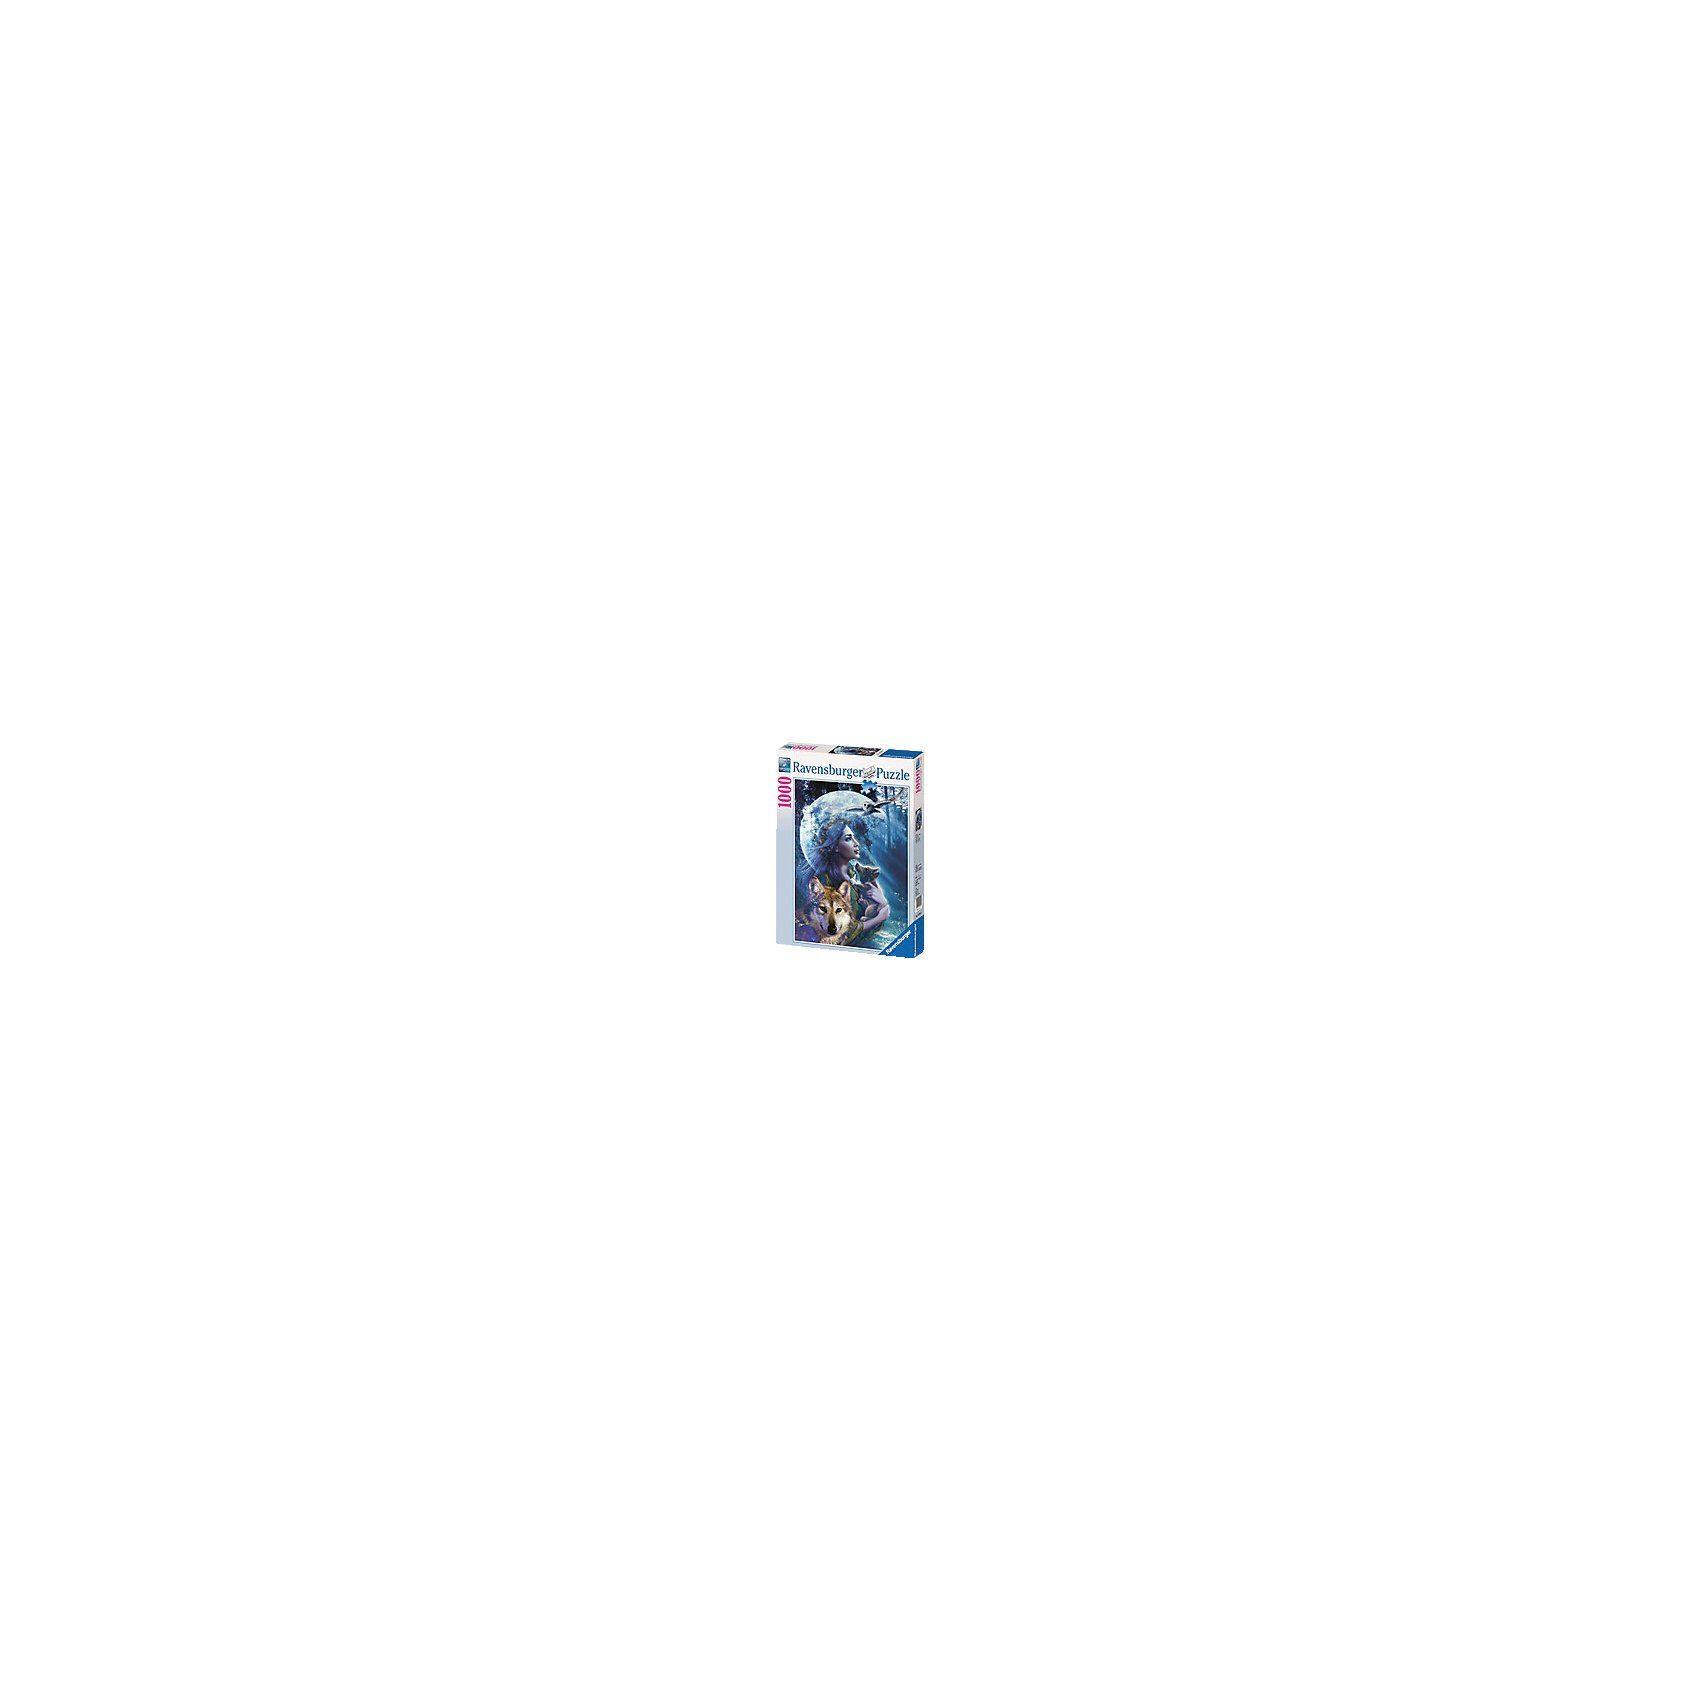 Ravensburger Puzzle-1000 Teile- Wolfsfrau